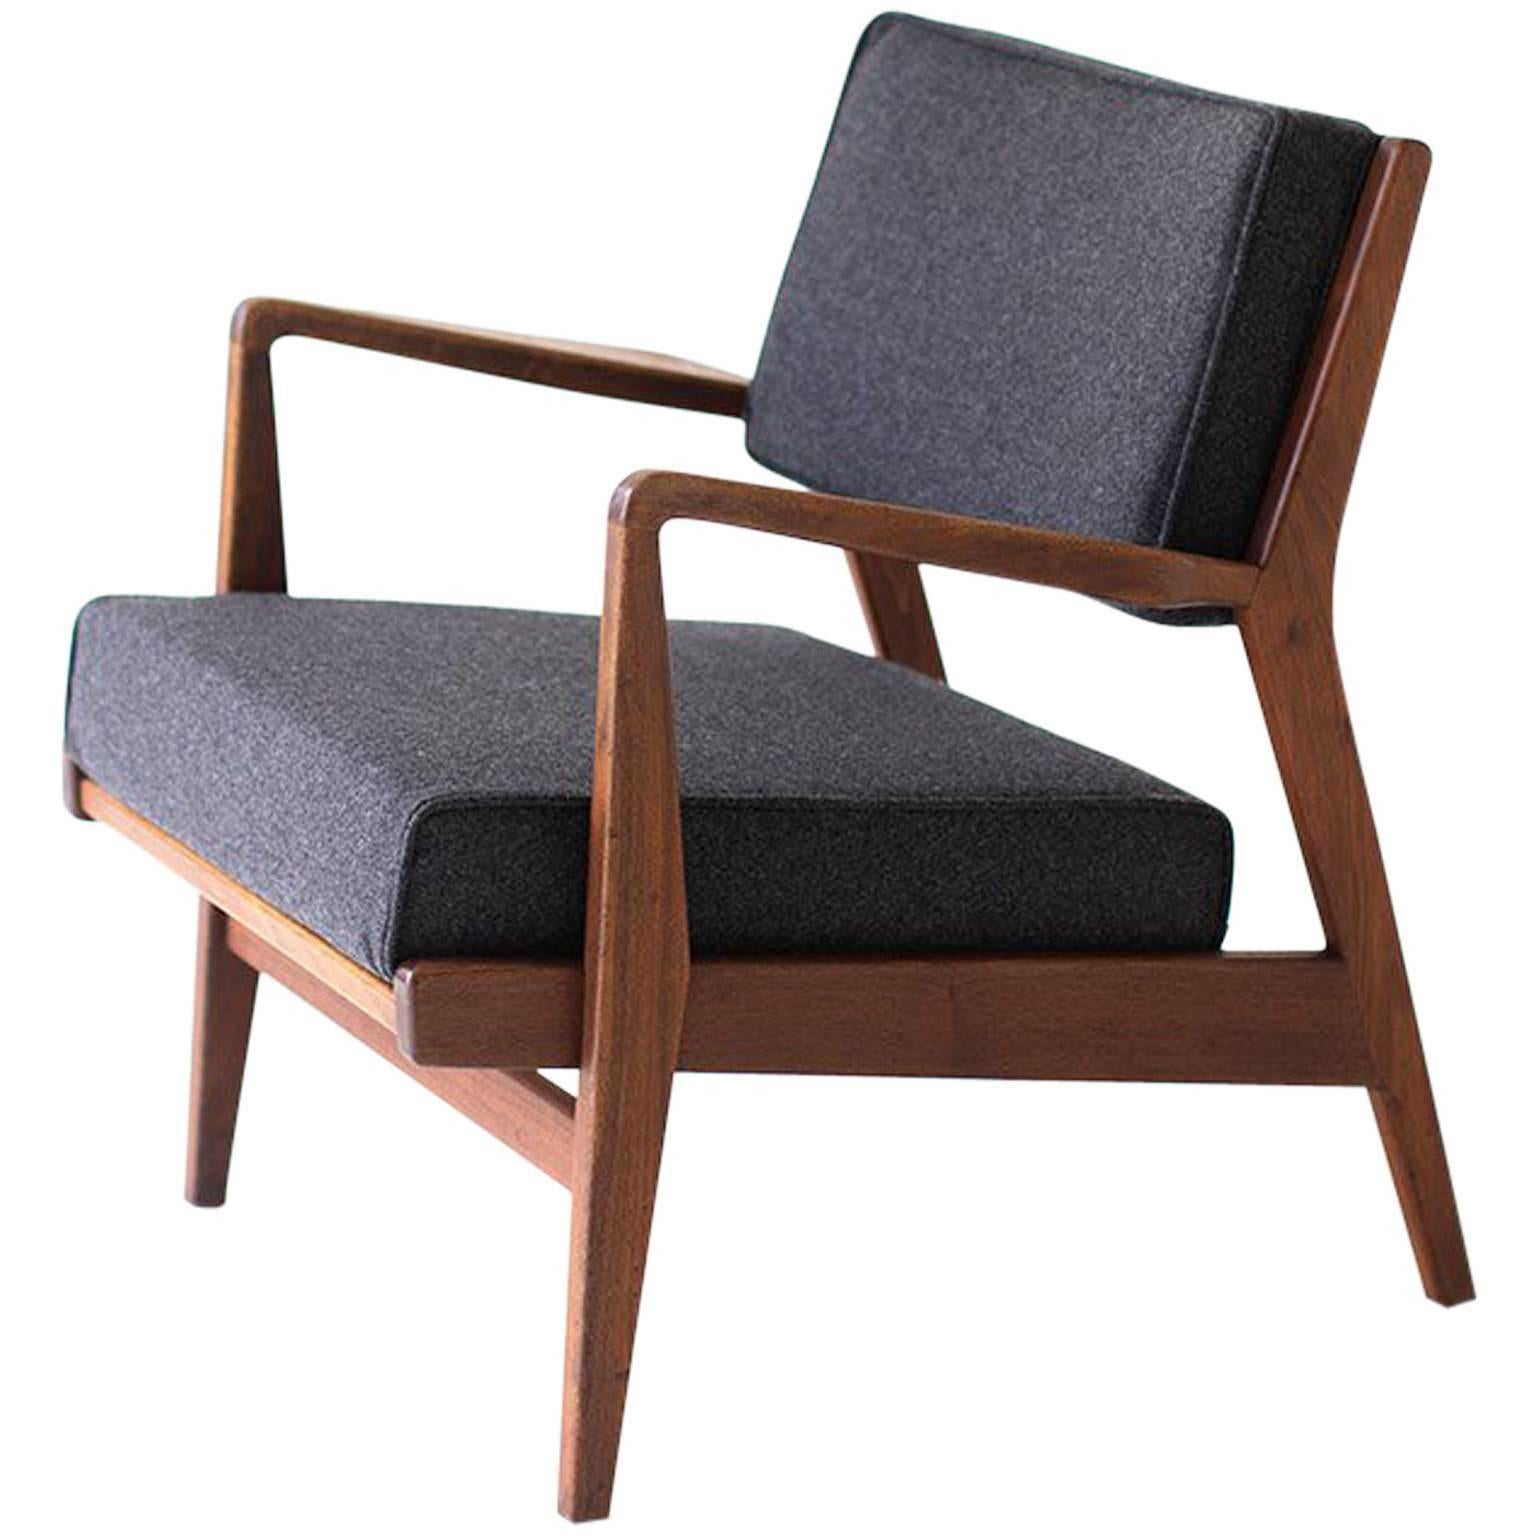 Jens Risom Lounge Chair for Risom Design Inc.